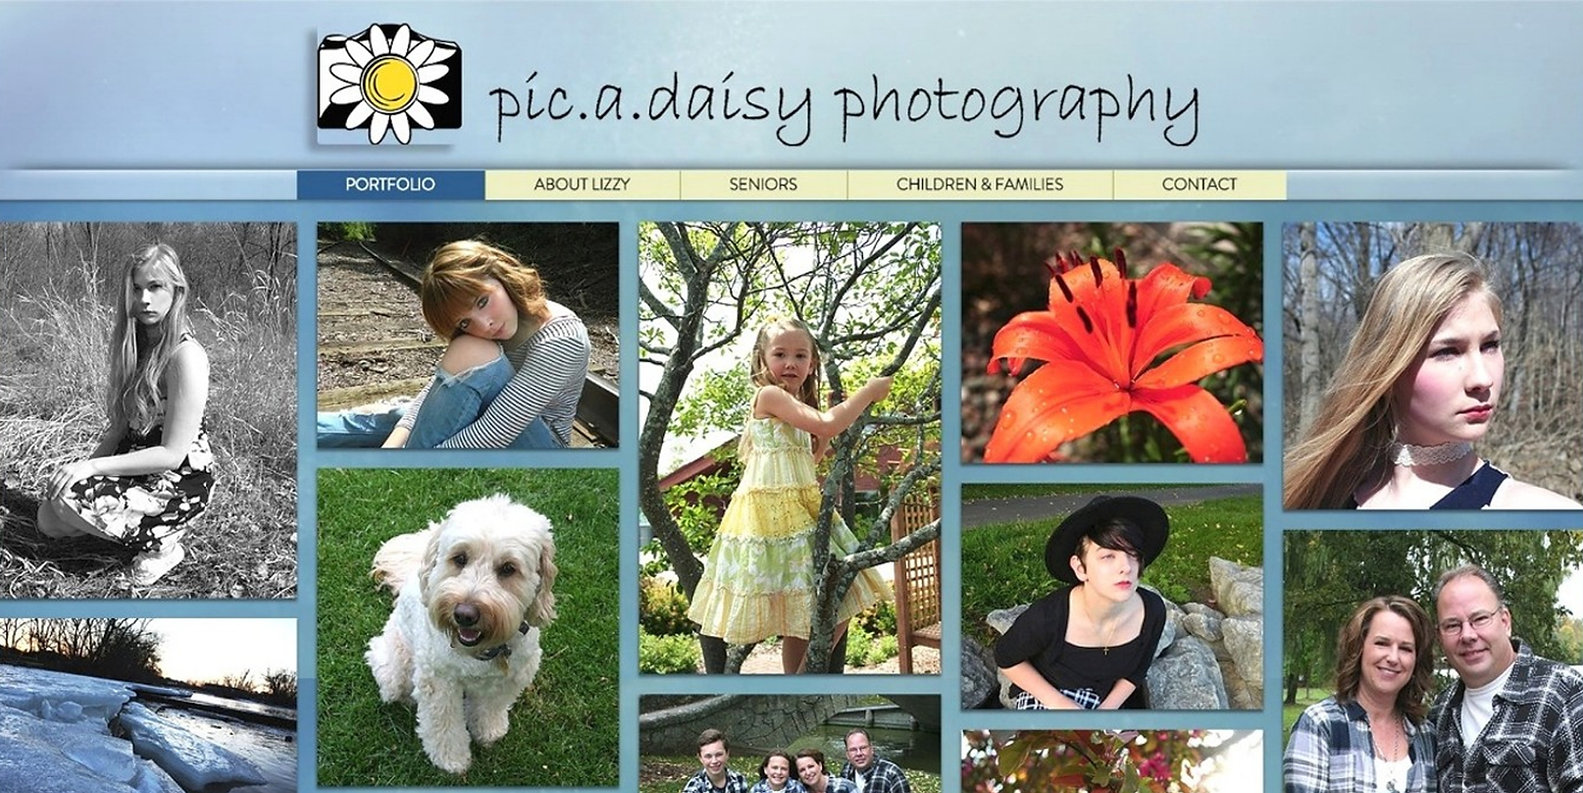 picadaisy website homepage screenshot bi